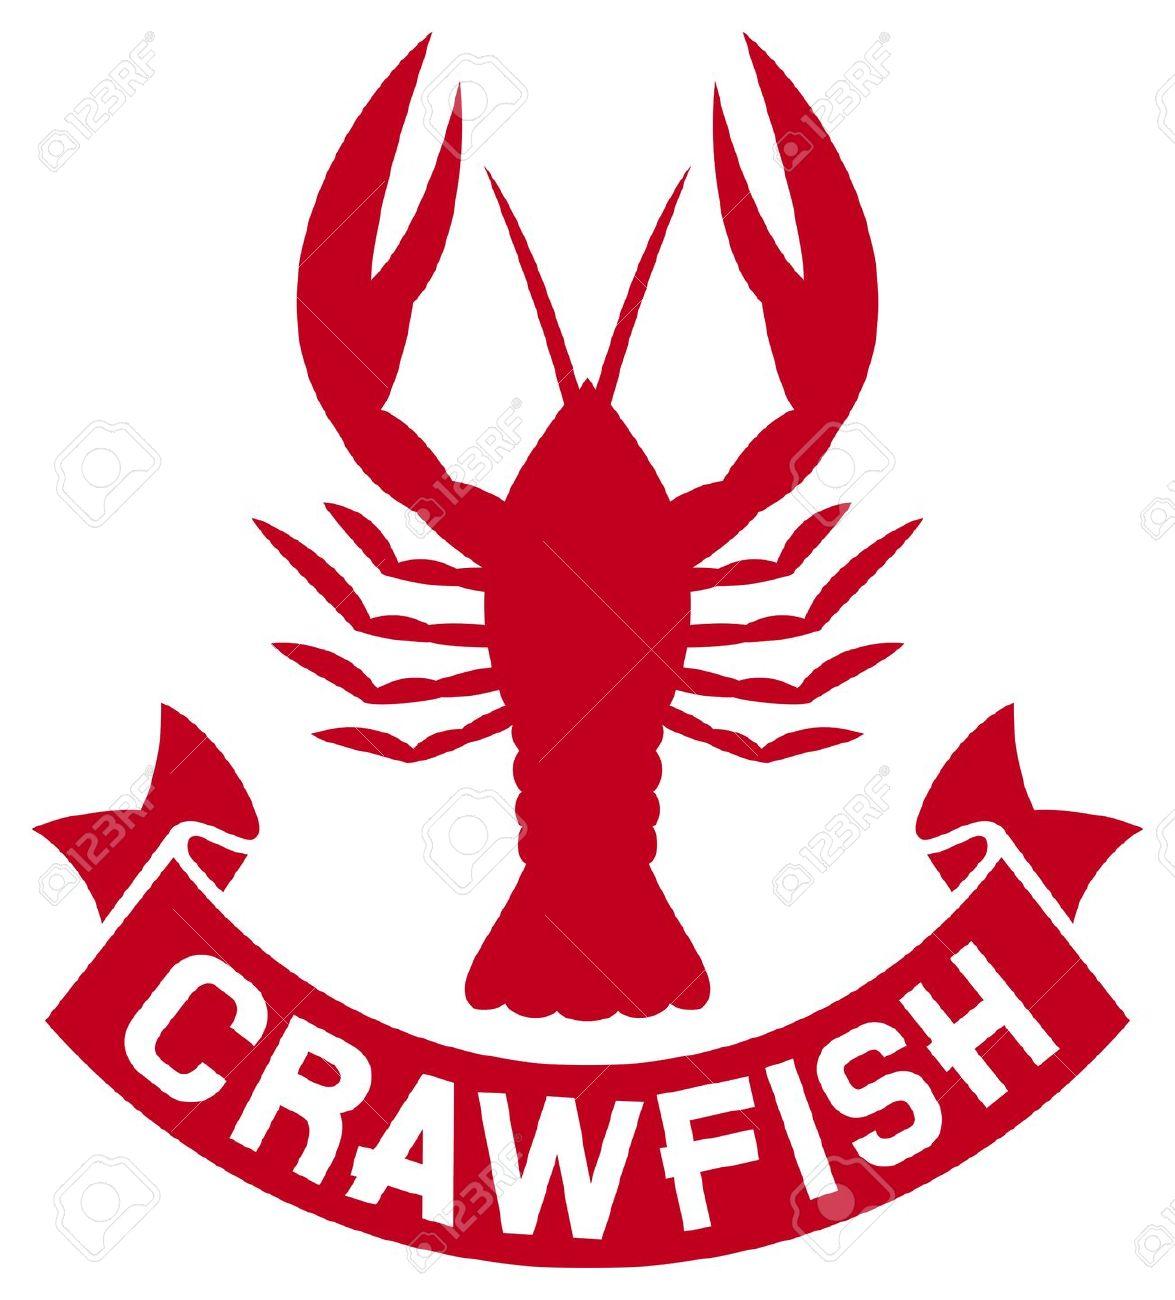 Crawfish: Crawfish Label .-crawfish: crawfish label .-12